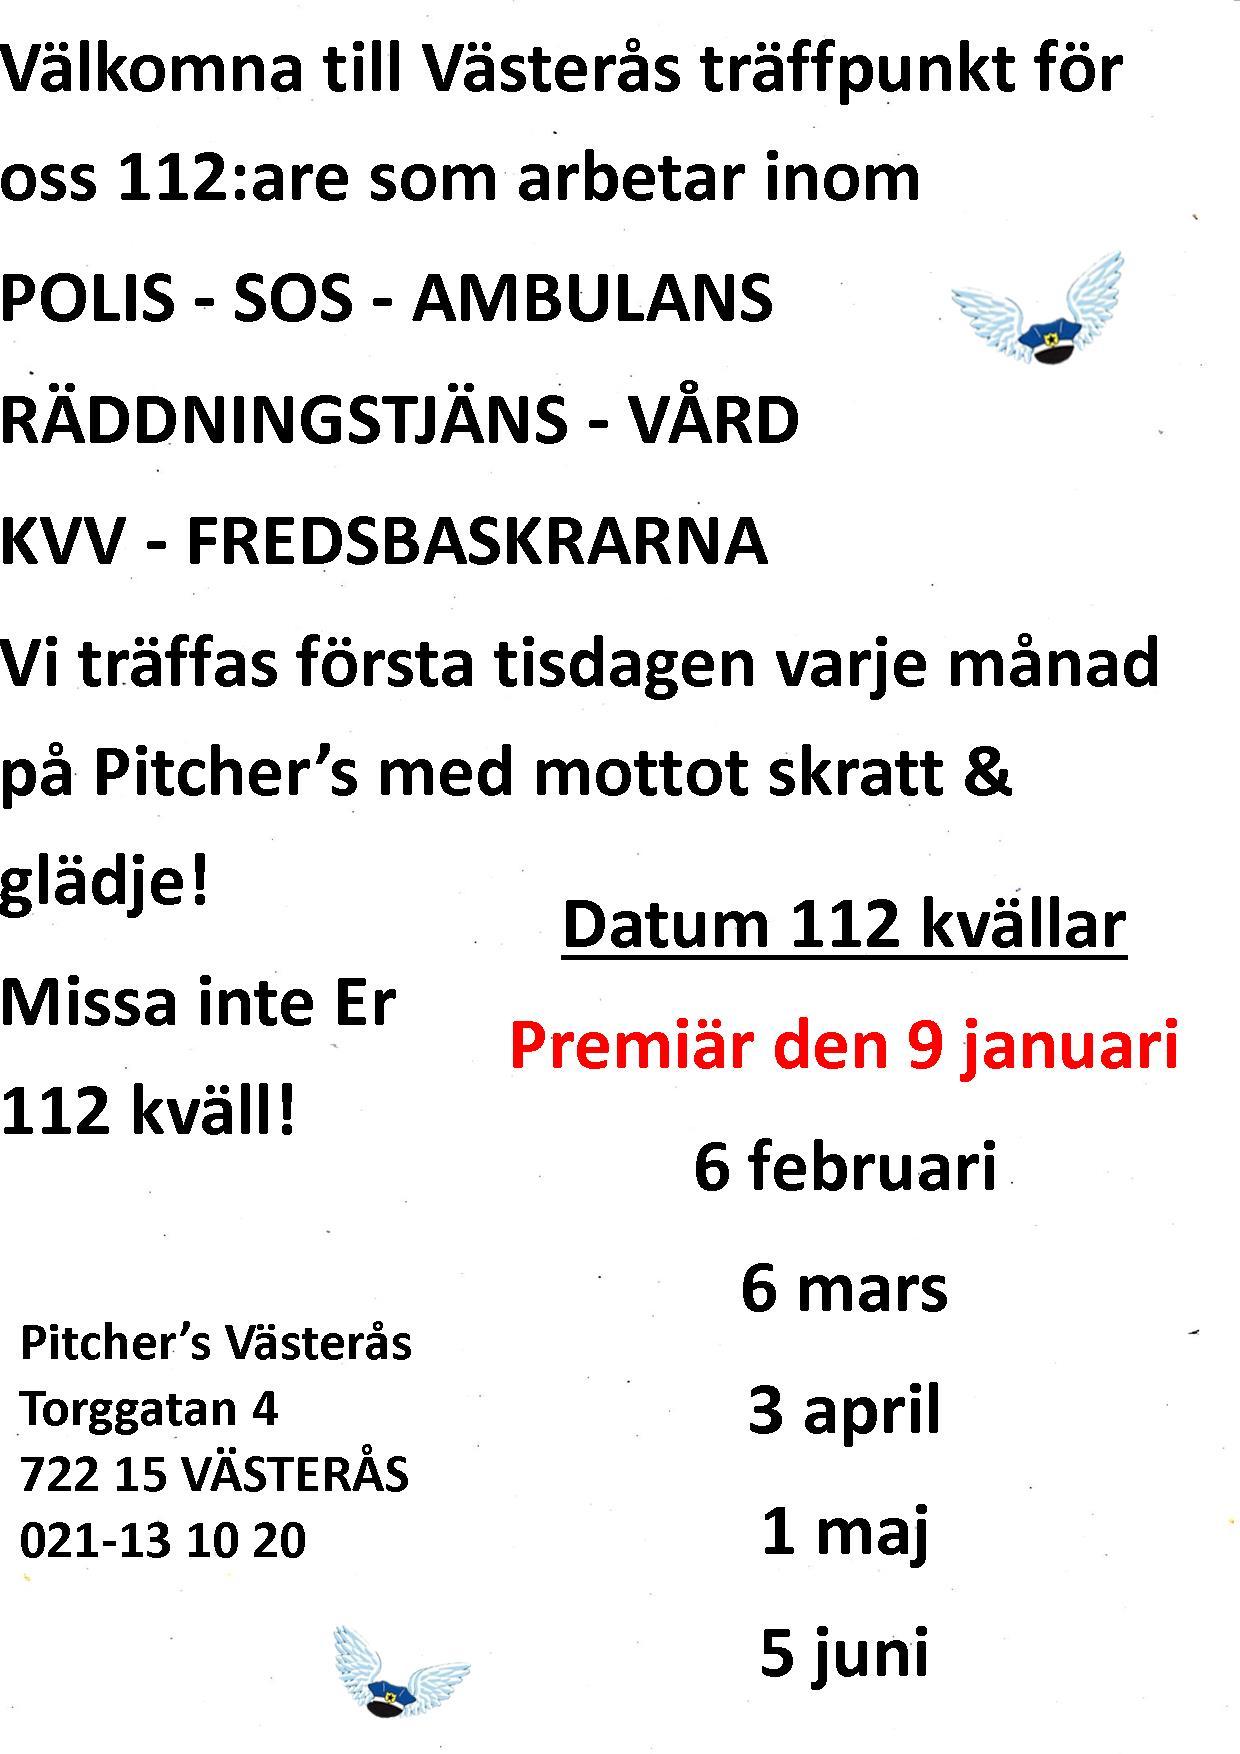 22 Västerås Pitchers TEXT HEMSIDAN ENGLAKLUBBEN